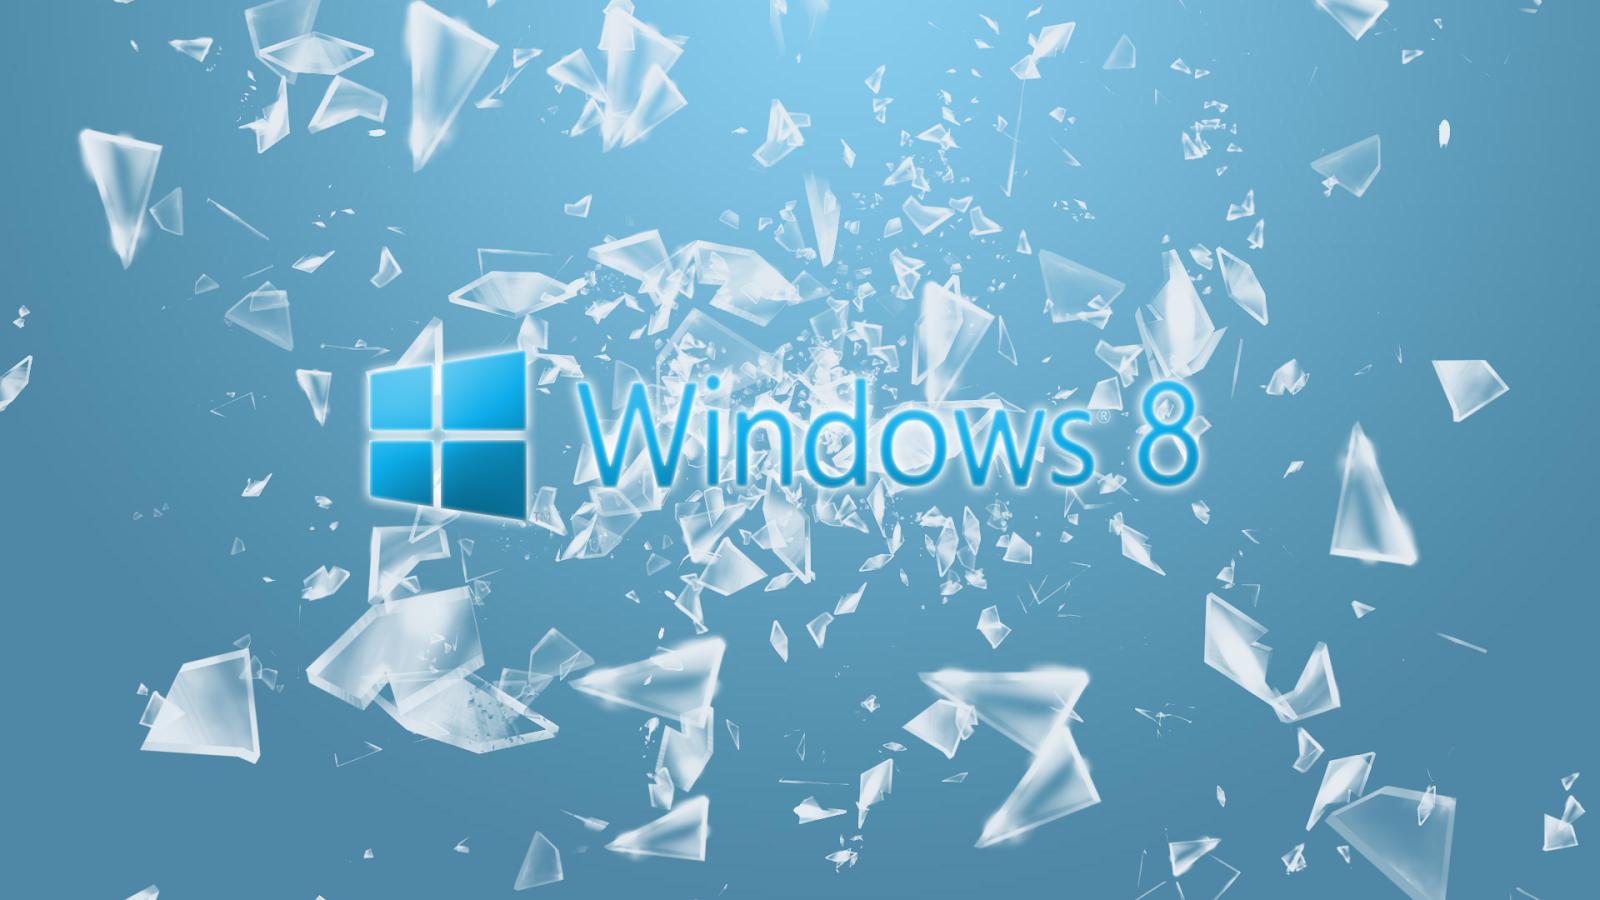 Download 3000+ Wallpaper Biru Windows  Paling Baru